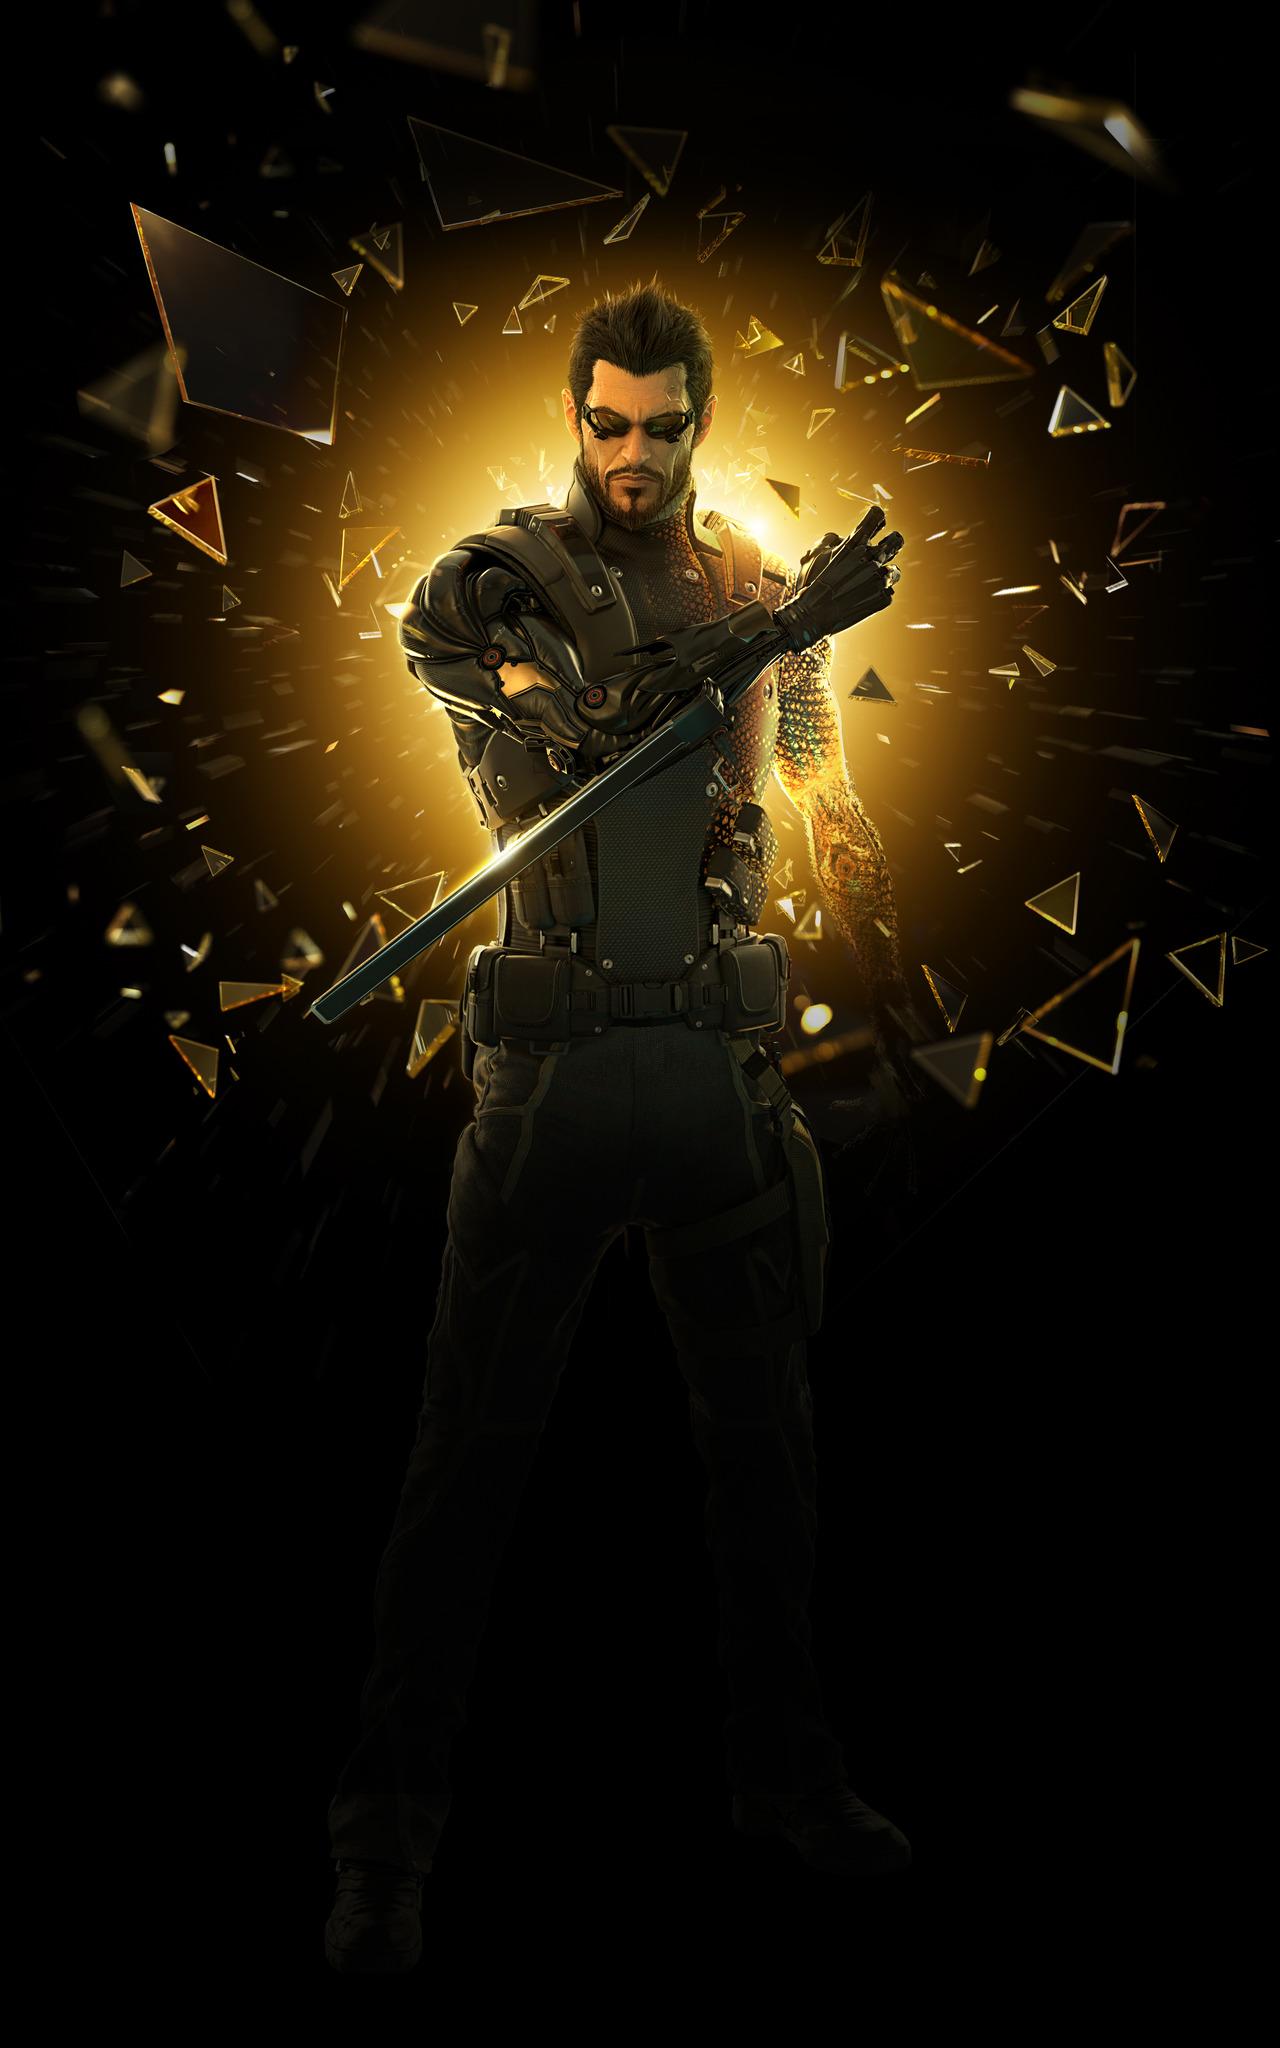 E3 2011 Galerie: Deus Ex: Human Revolution 43928